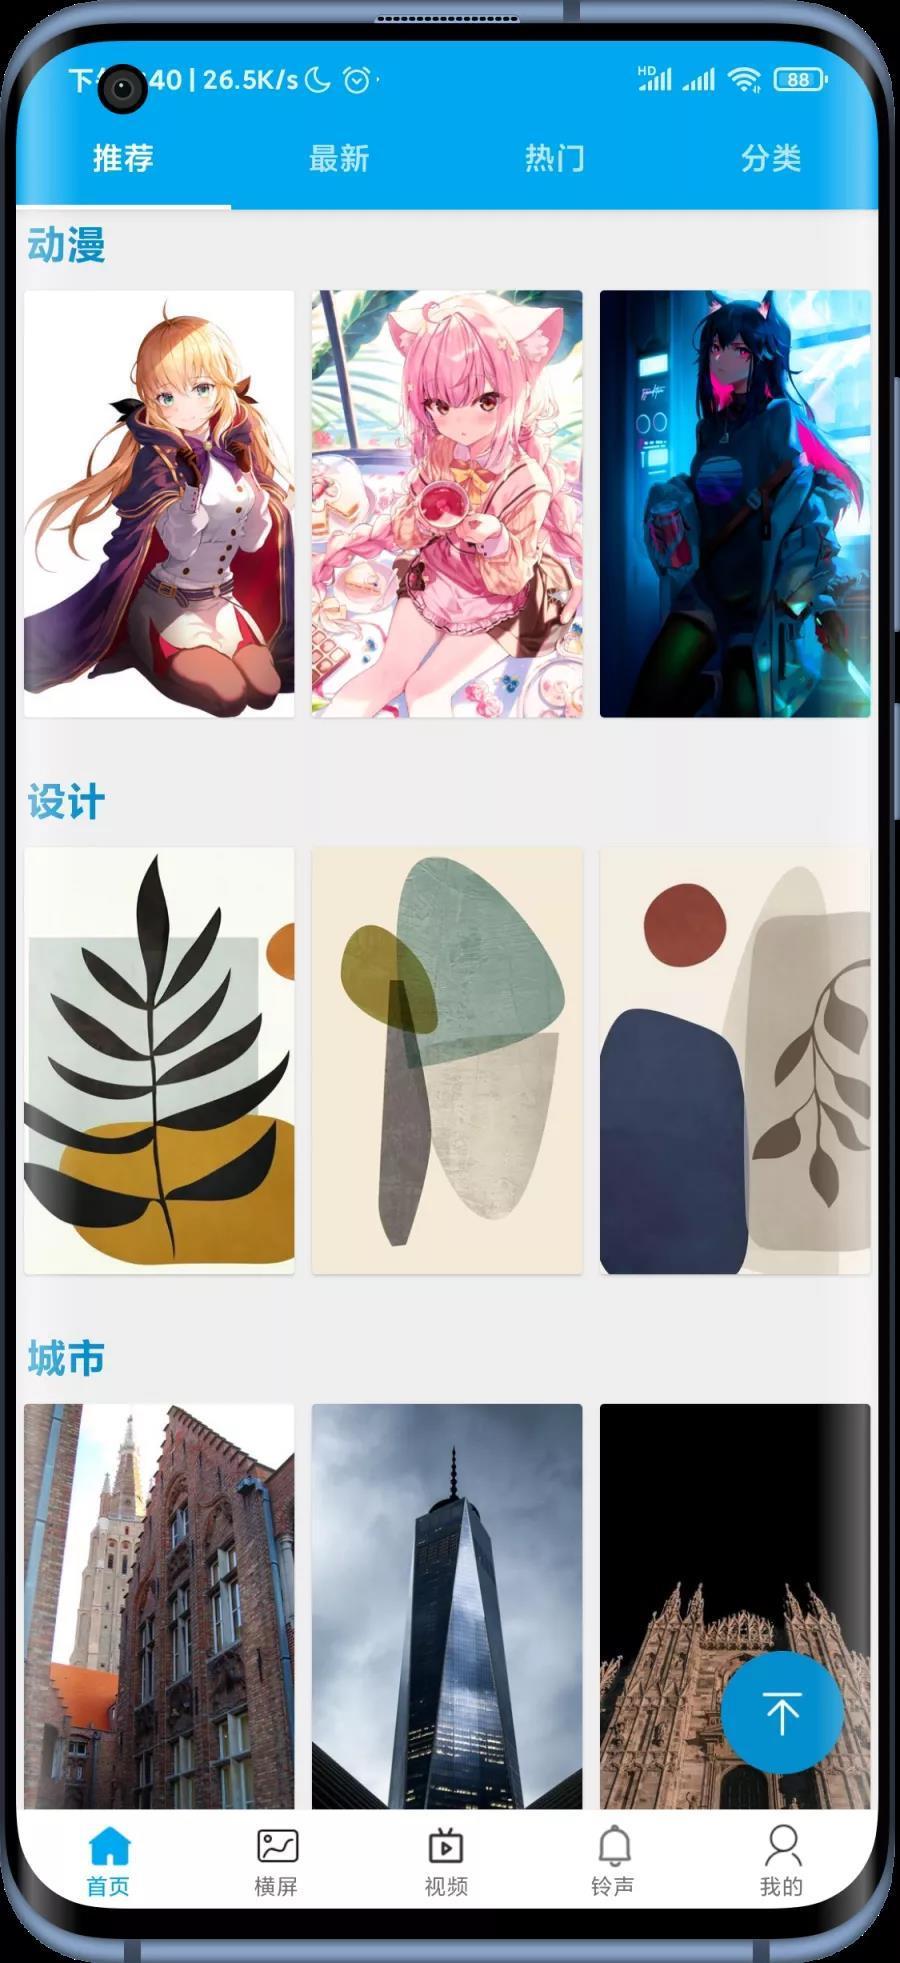 5fda28573ffa7d37b3a09d09 美女壁纸(安卓)--超级丰富的各种类型壁纸推荐